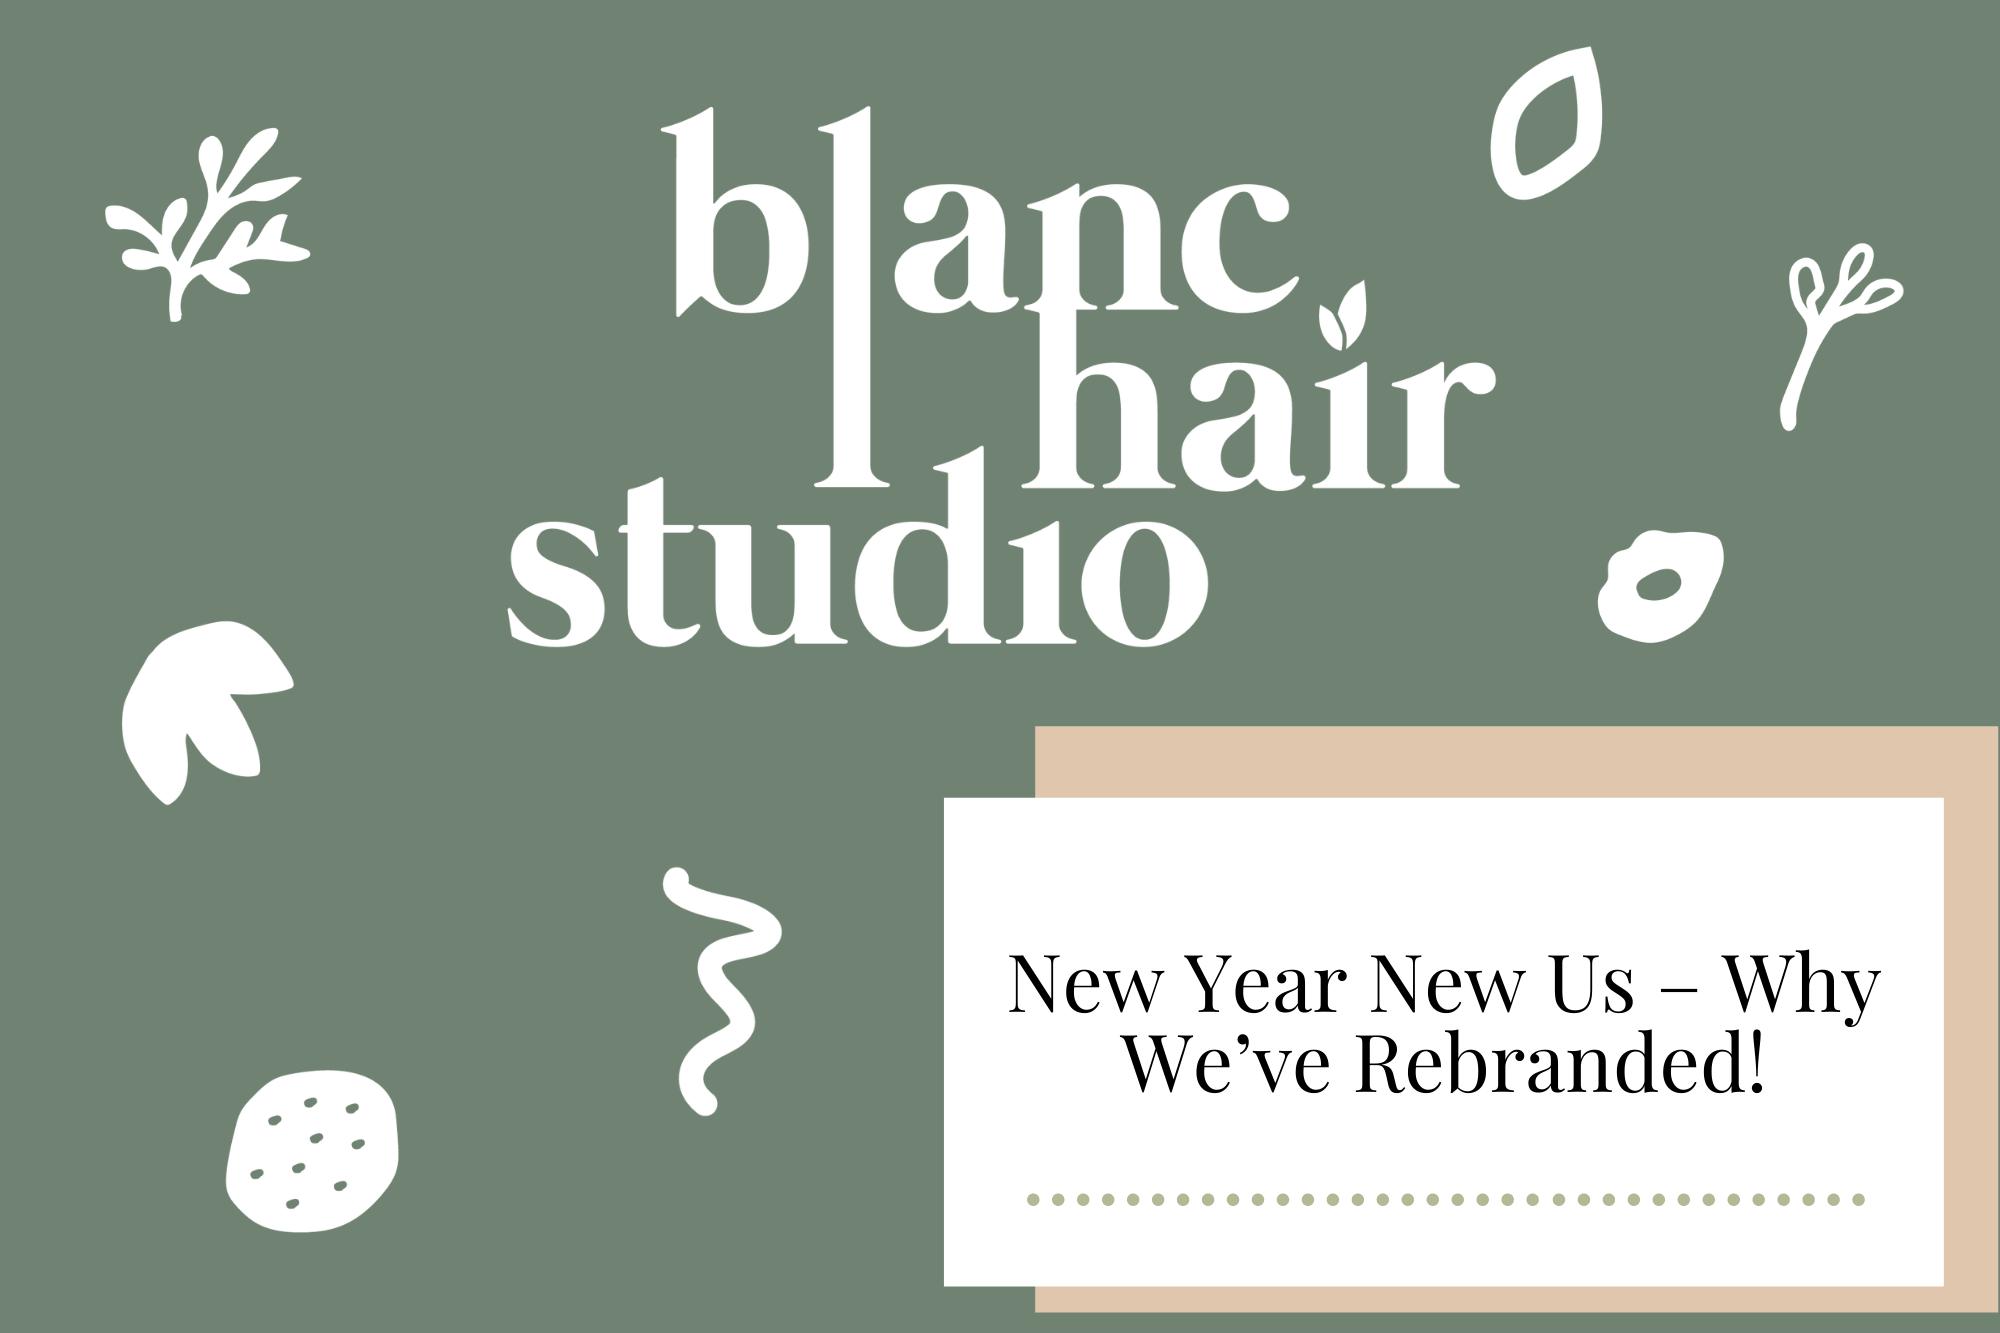 New Year New Us - Why We've Rebranded! - Newcastle Hair Salon - Blanc Hair Studio